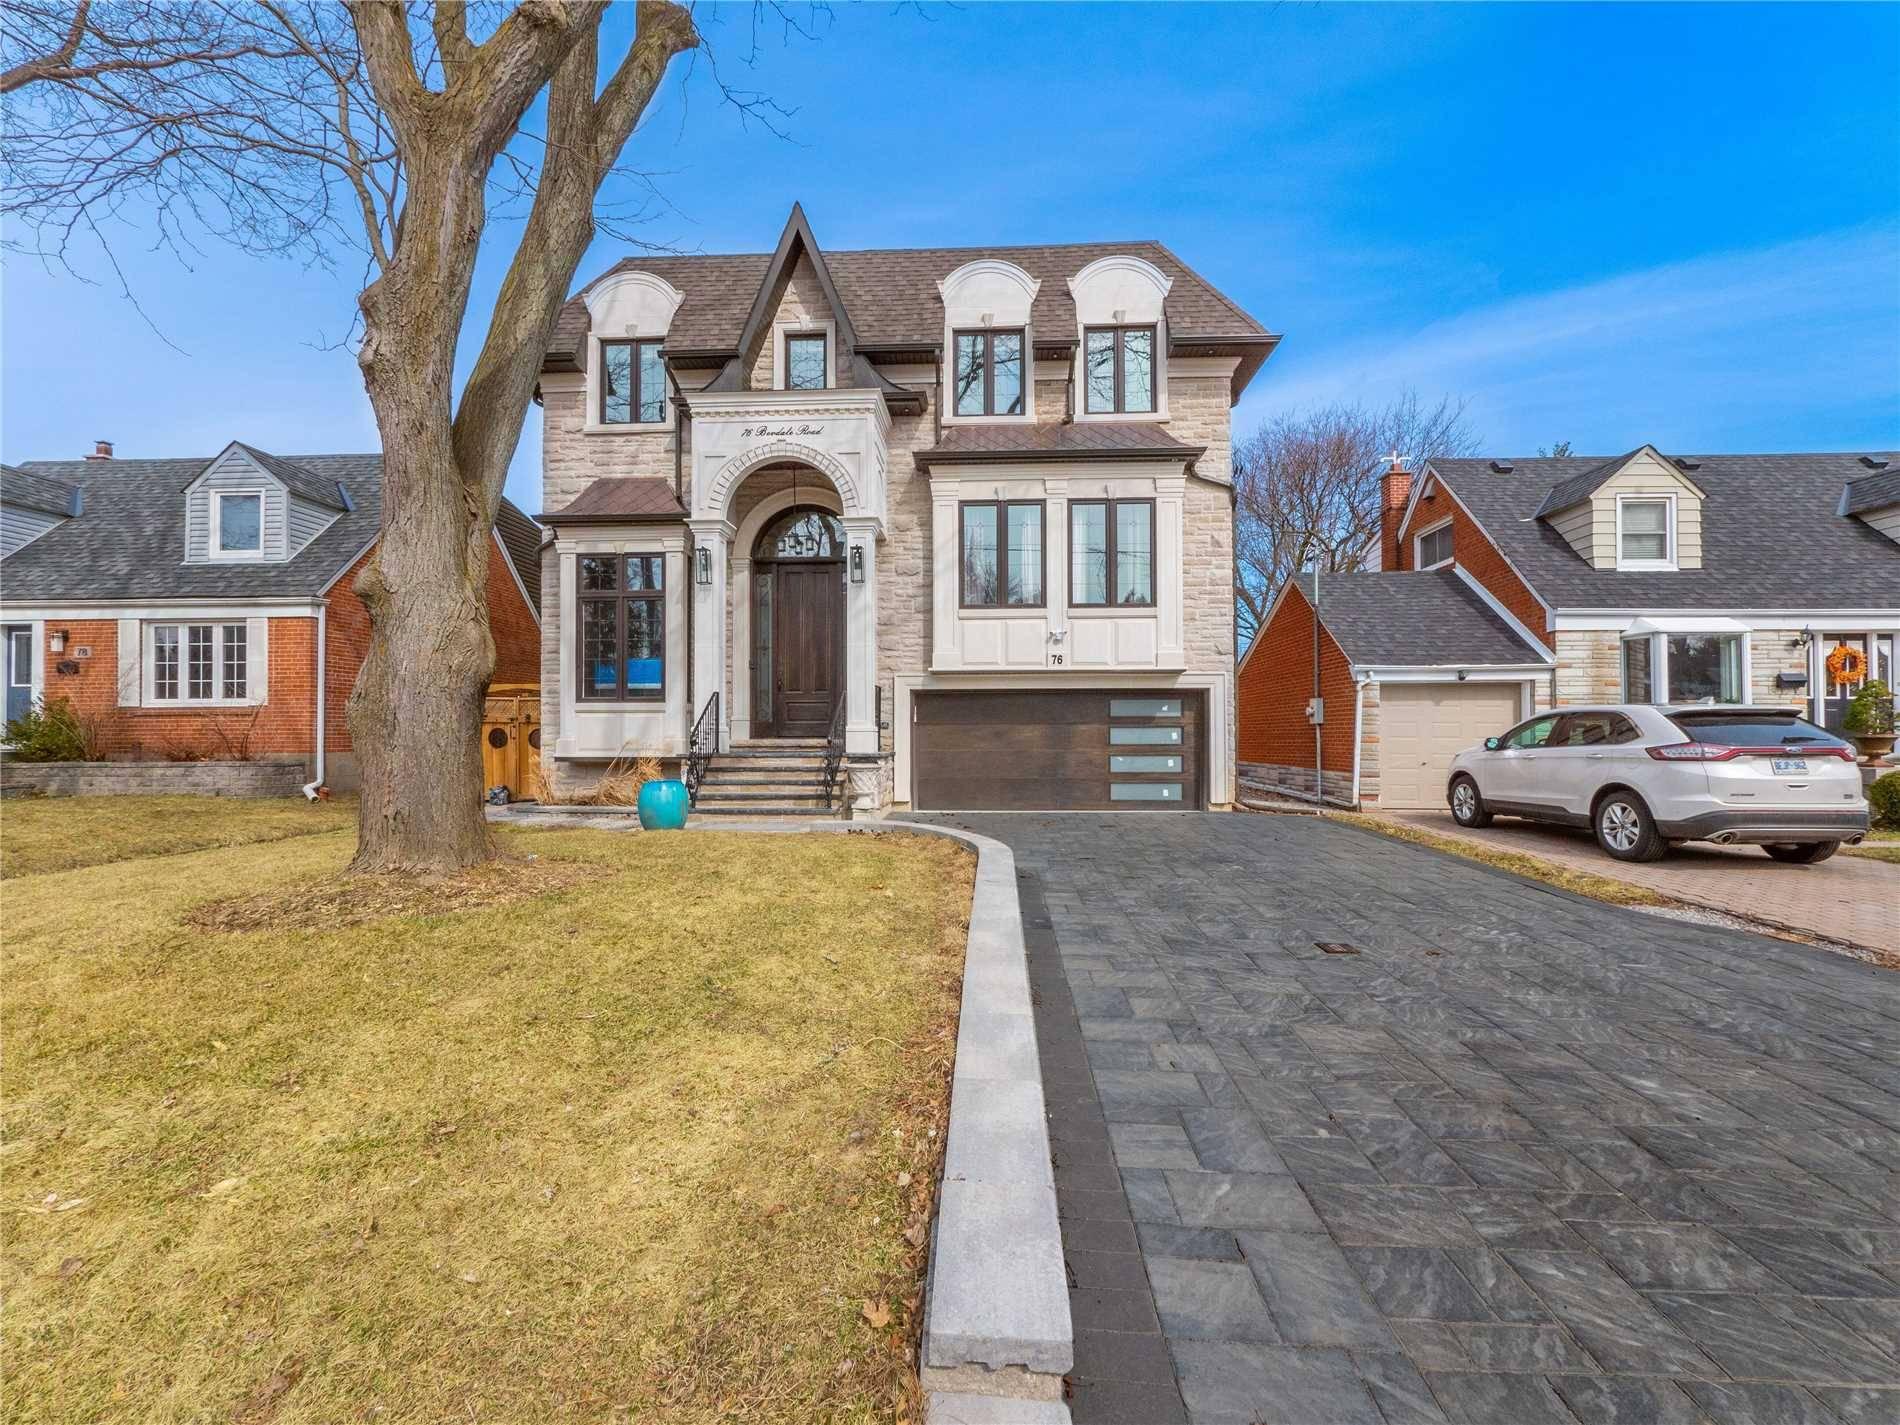 House for sale at 76 Bevdale Rd Toronto Ontario - MLS: C4518206